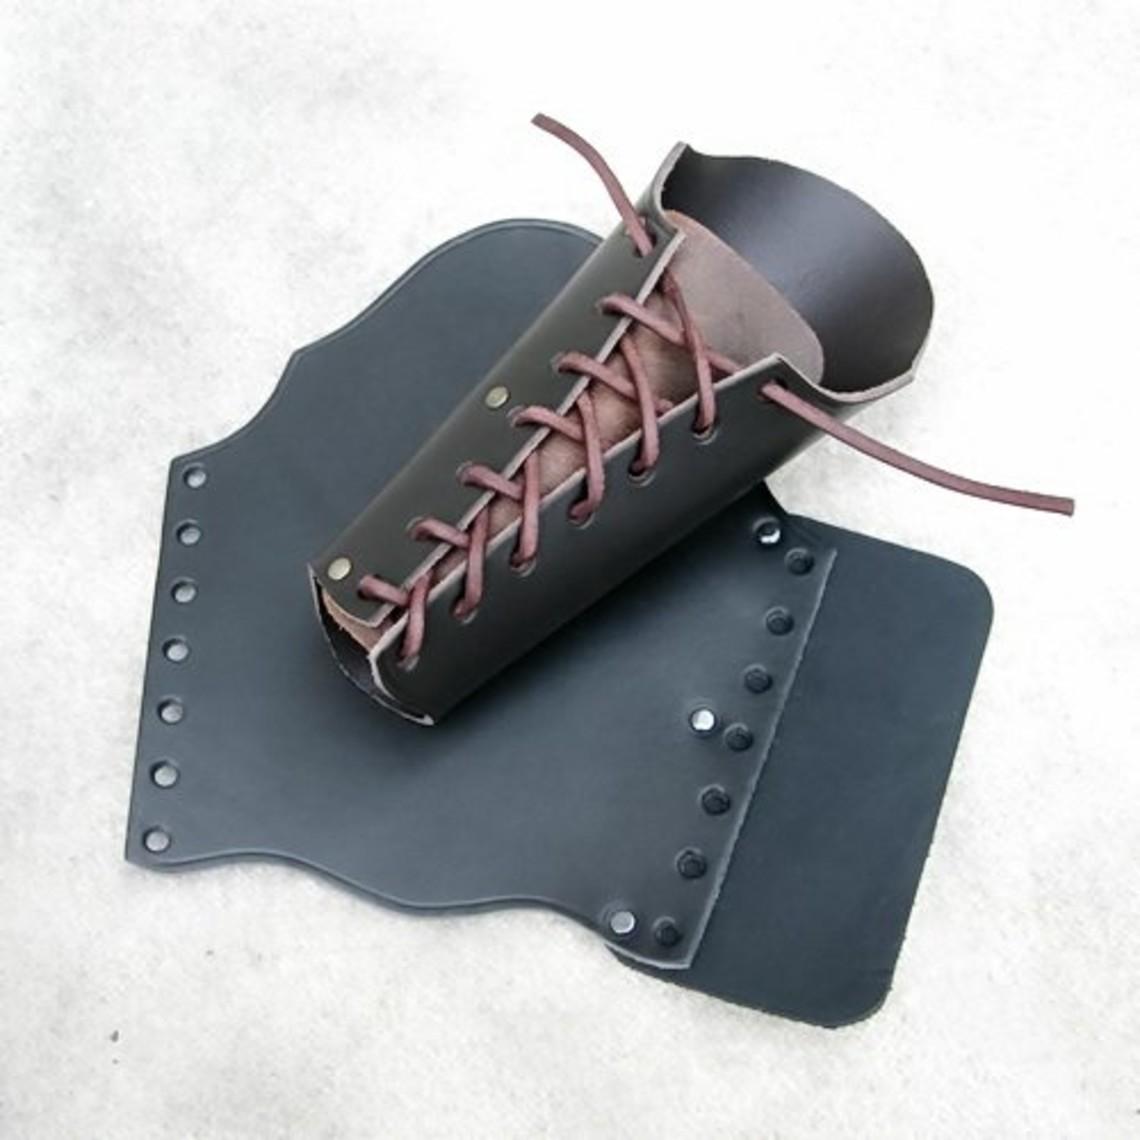 vambrace de cuero 23 cm, negro